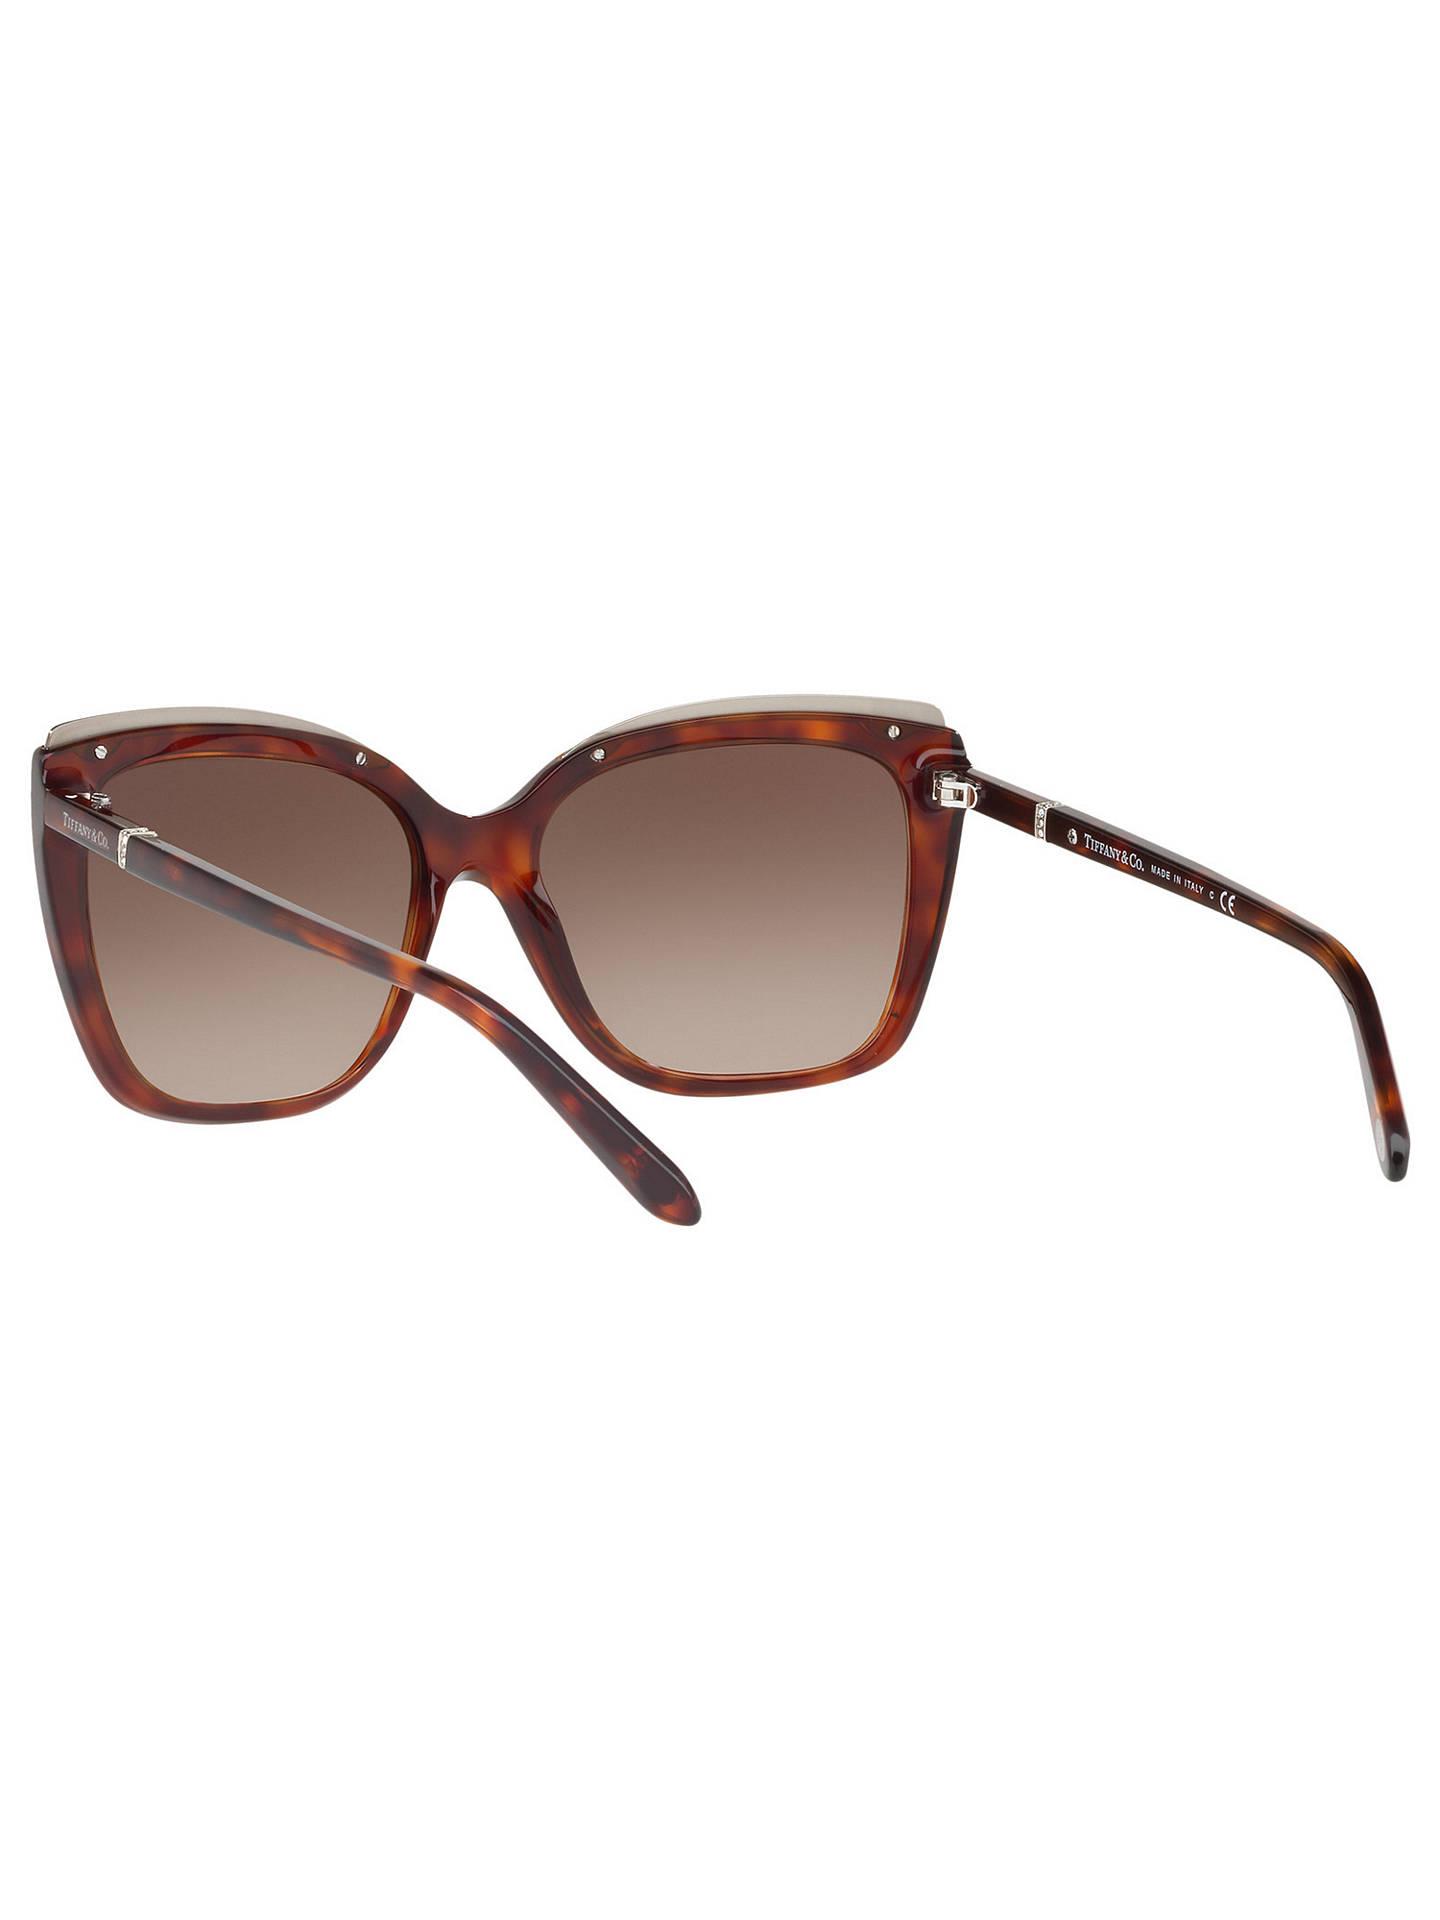 82999bb5d7 Tiffany & Co TF4135B Oversize Square Sunglasses, Tortoise/Brown Gradient